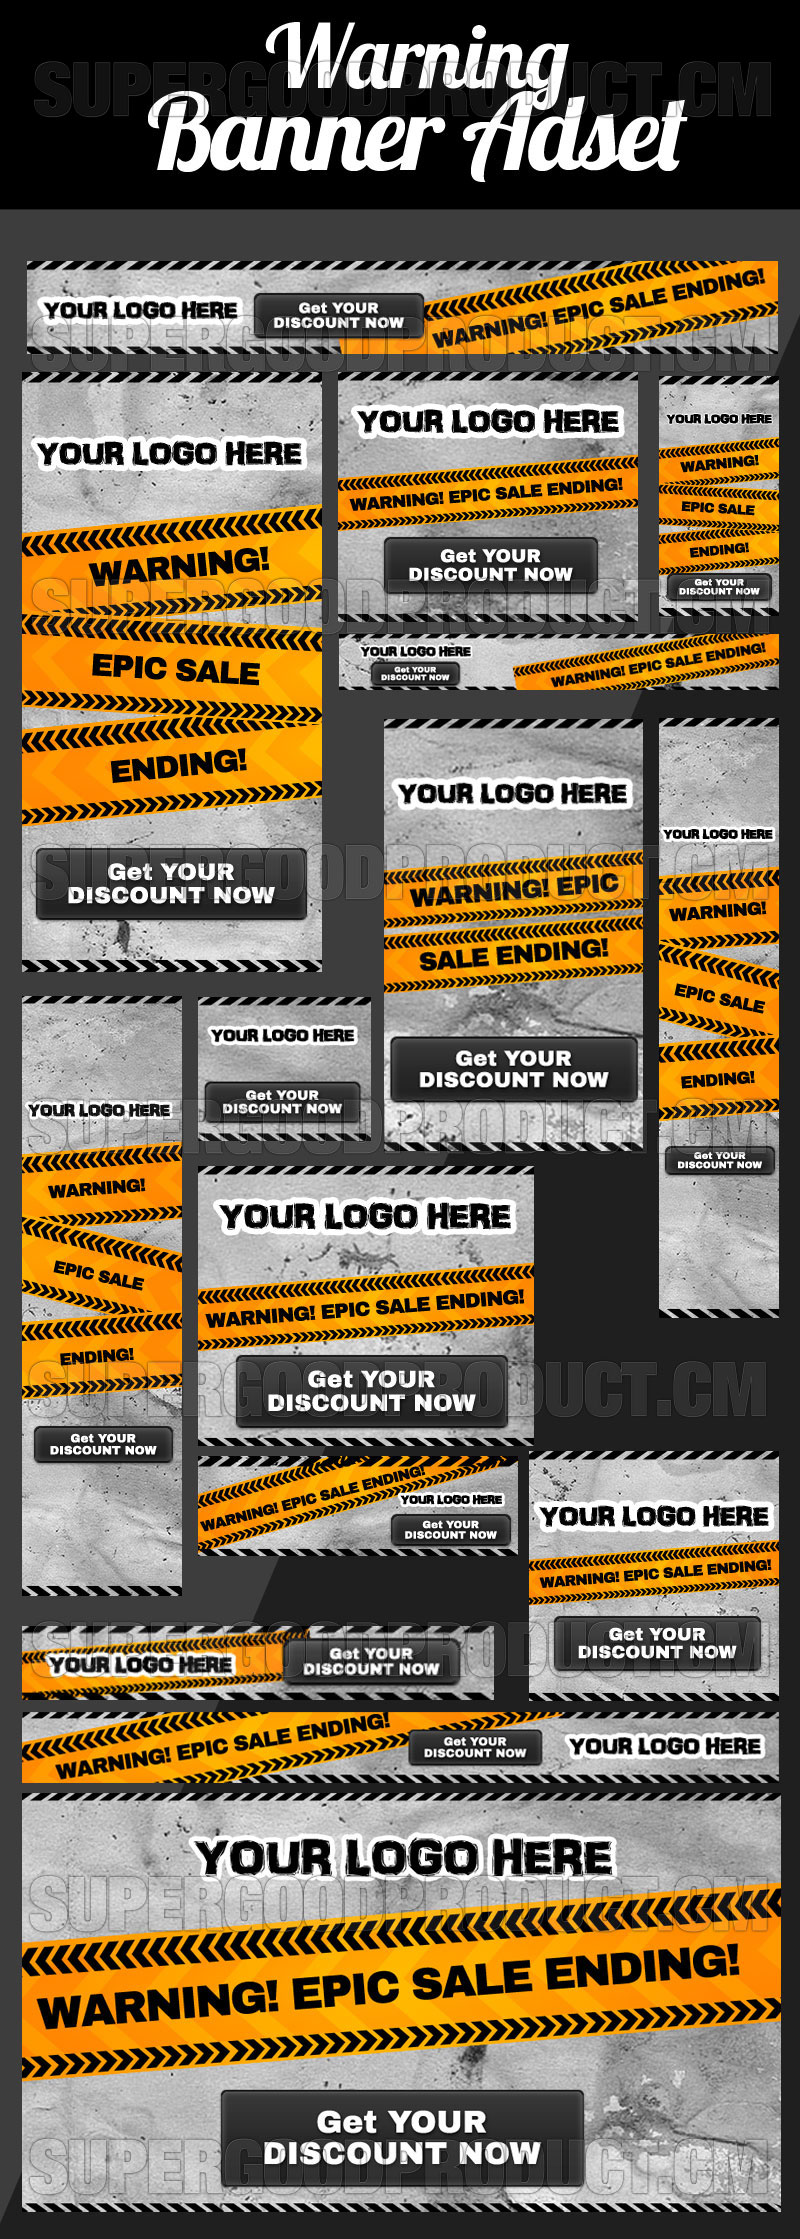 Warning-Banner-Adset